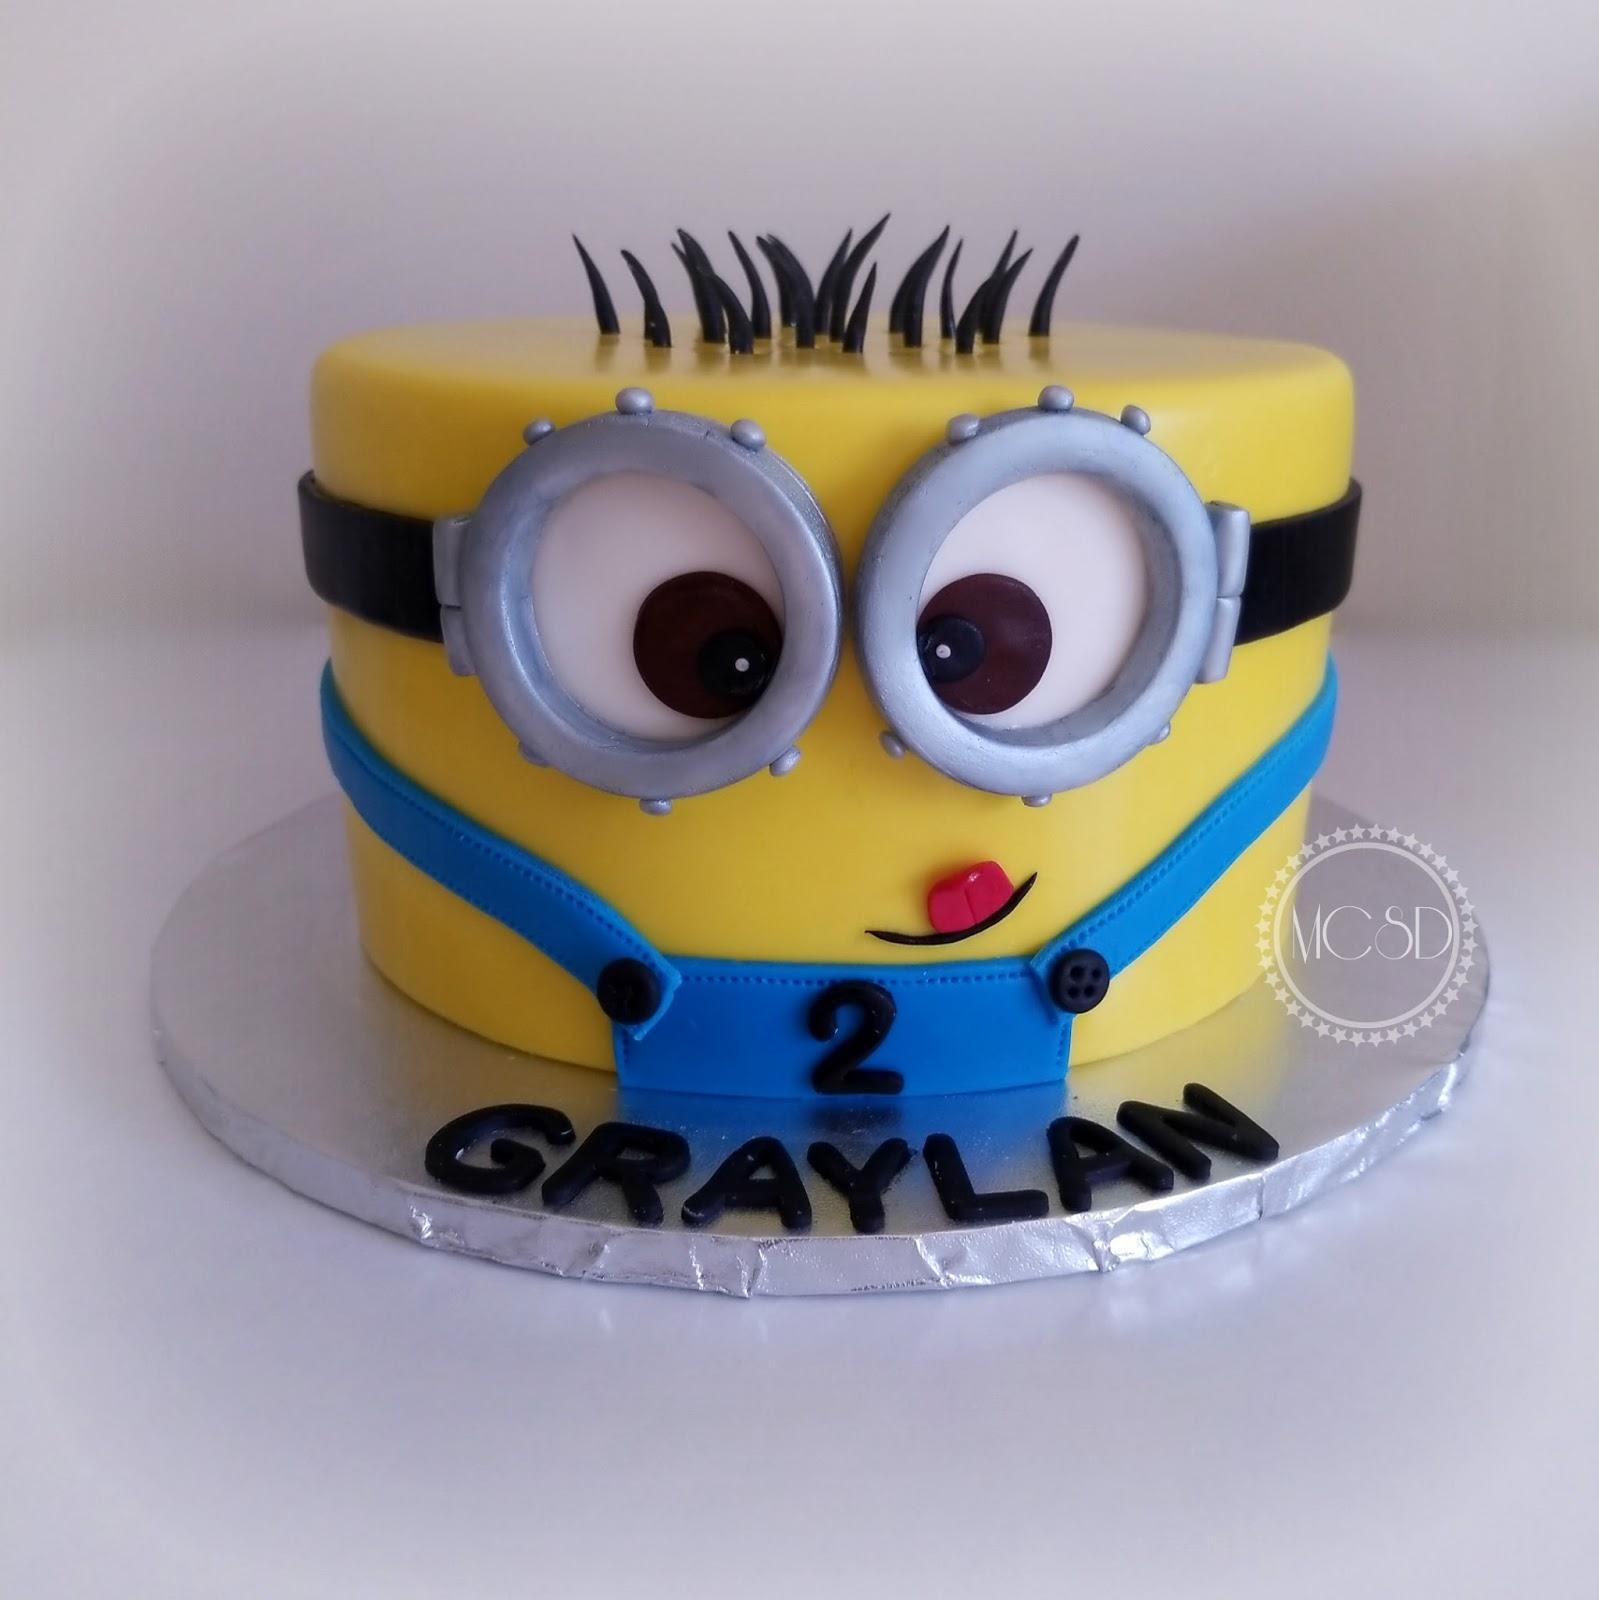 My Cake Sweet Dreams Minion Birthday Cake